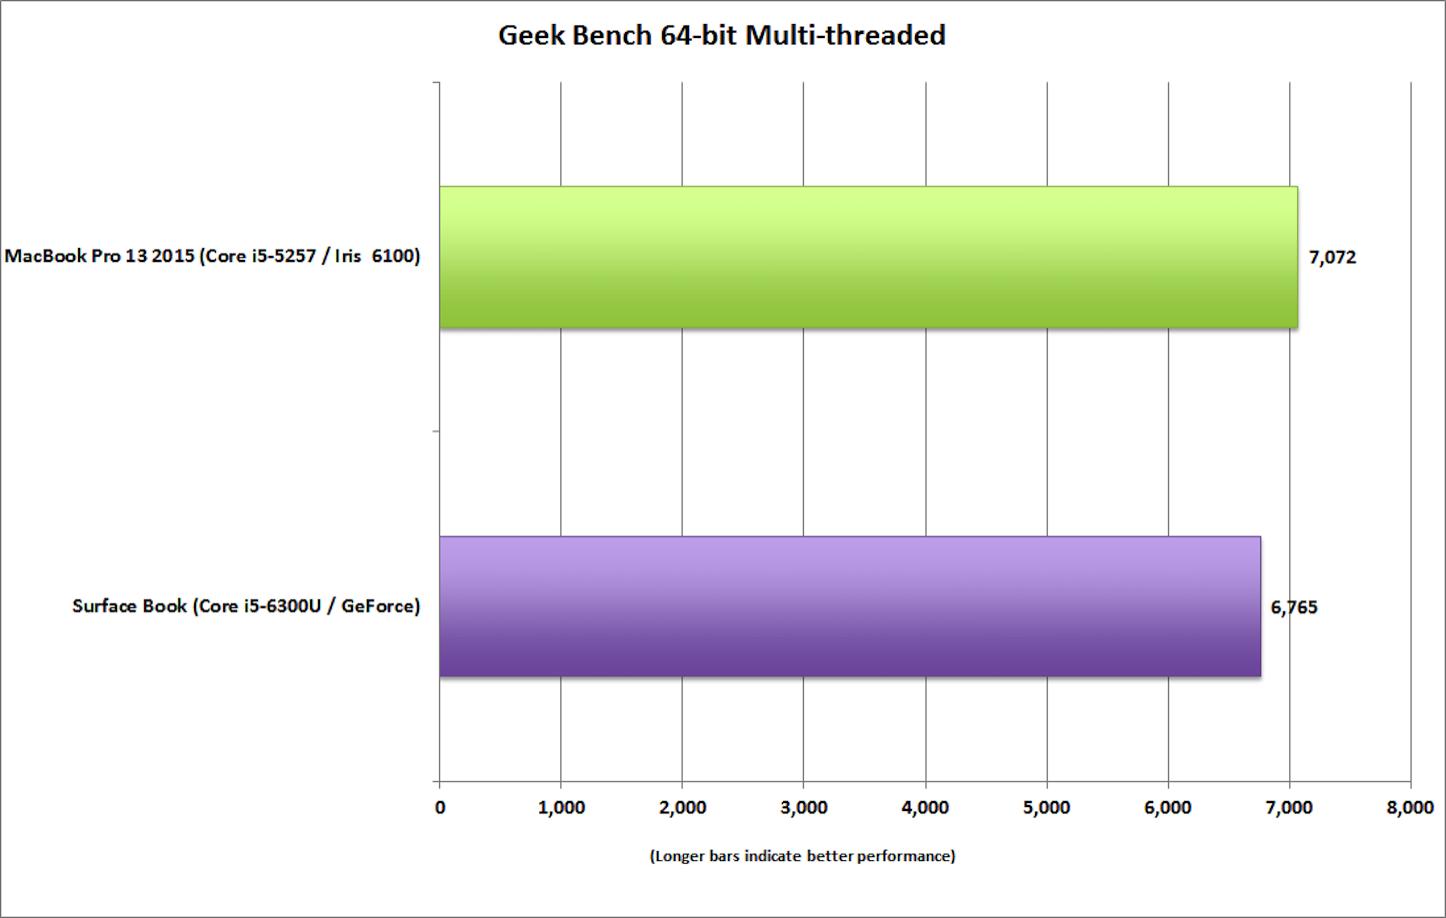 Surface book vs macbook pro 13 geekbench multi